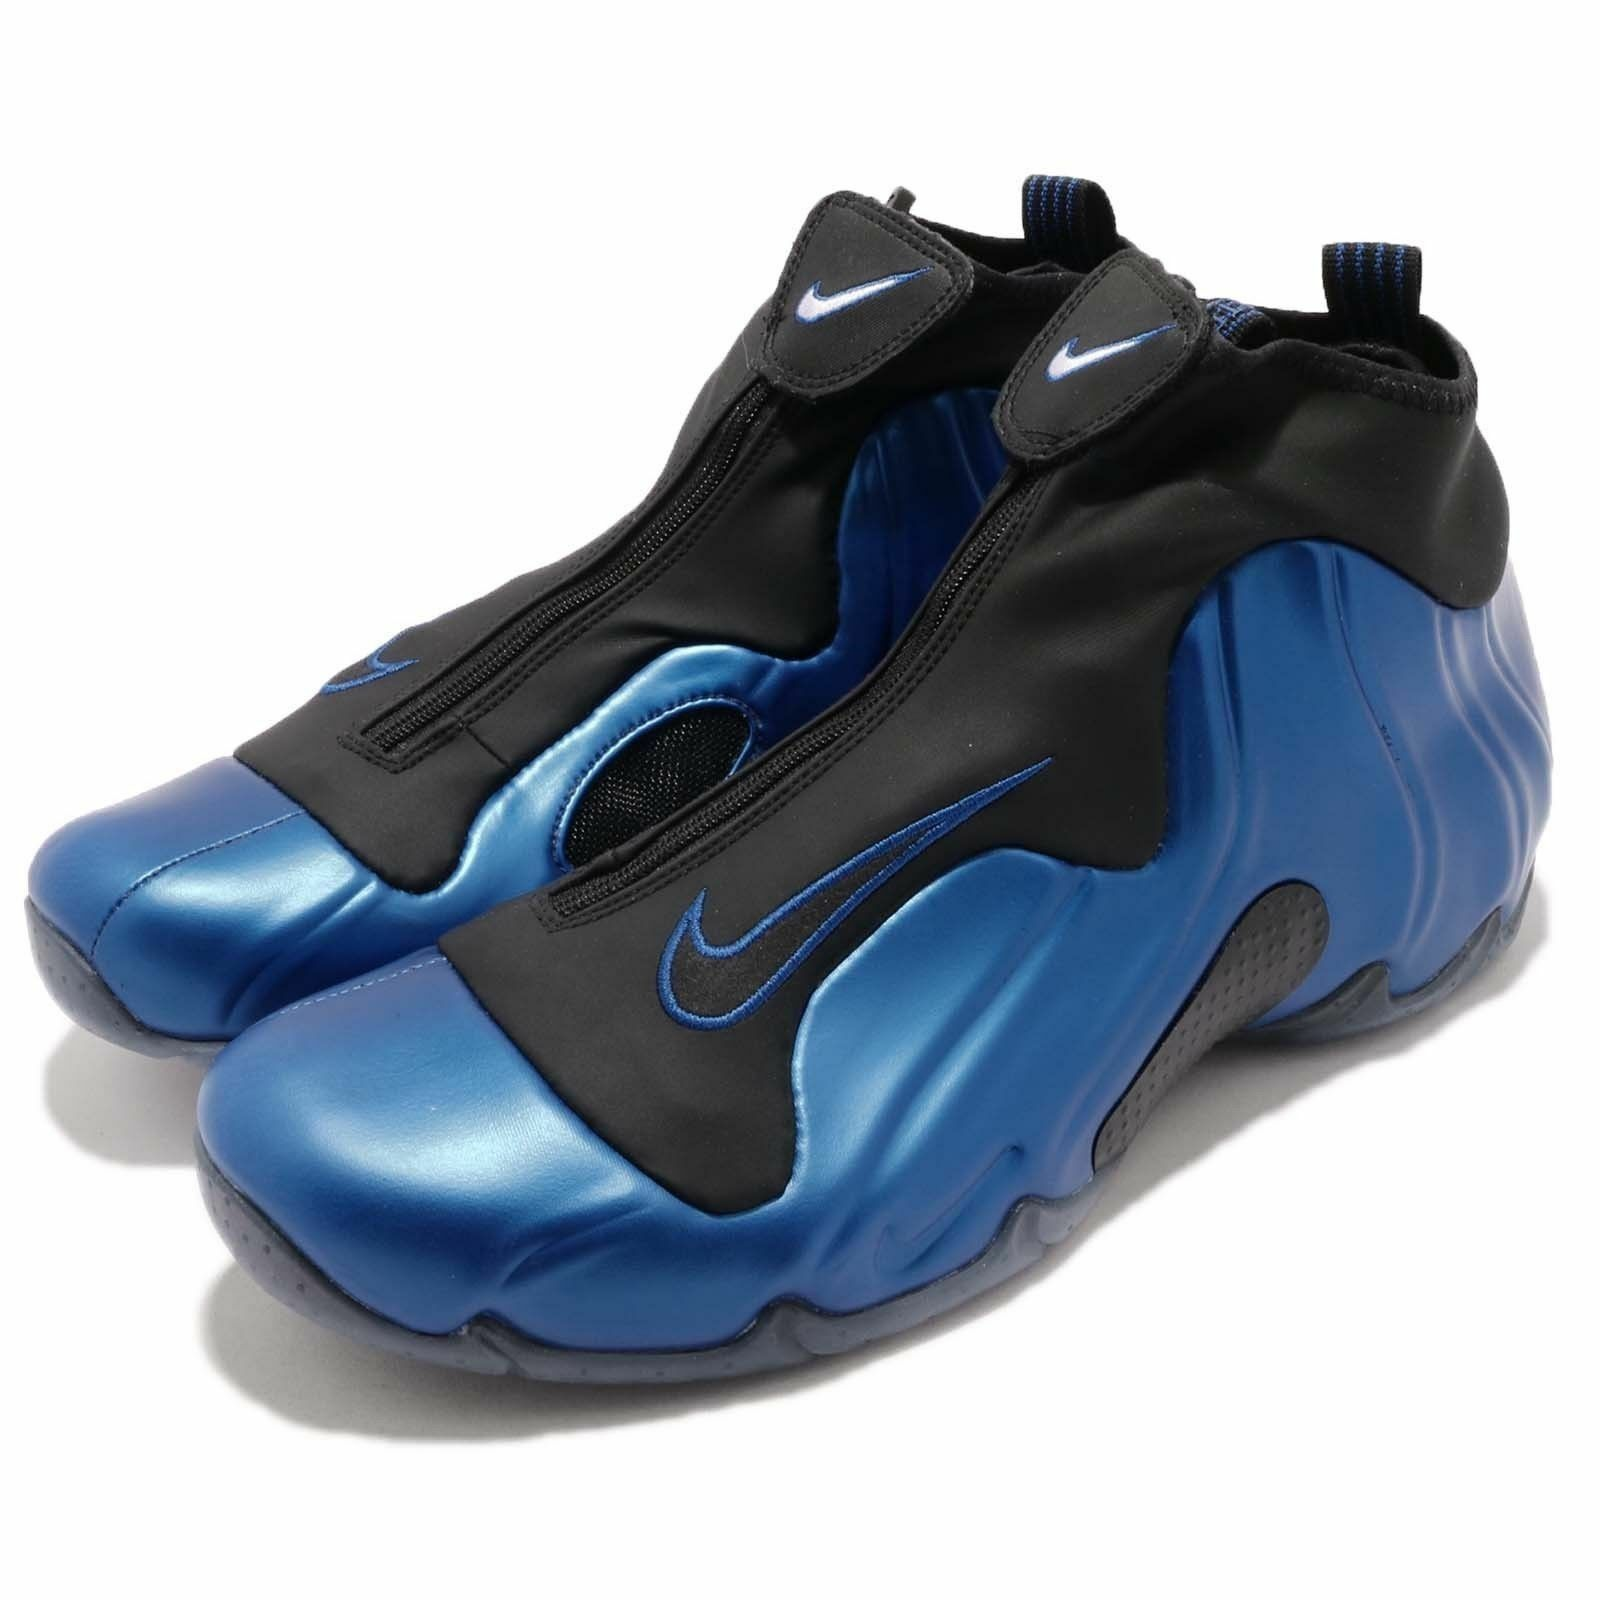 a8d63c4911 Nike Air Flightposite AO9378 Dark Neon Royal Men 13 2018 Release New 500  Size pwrjha462-Athletic Shoes